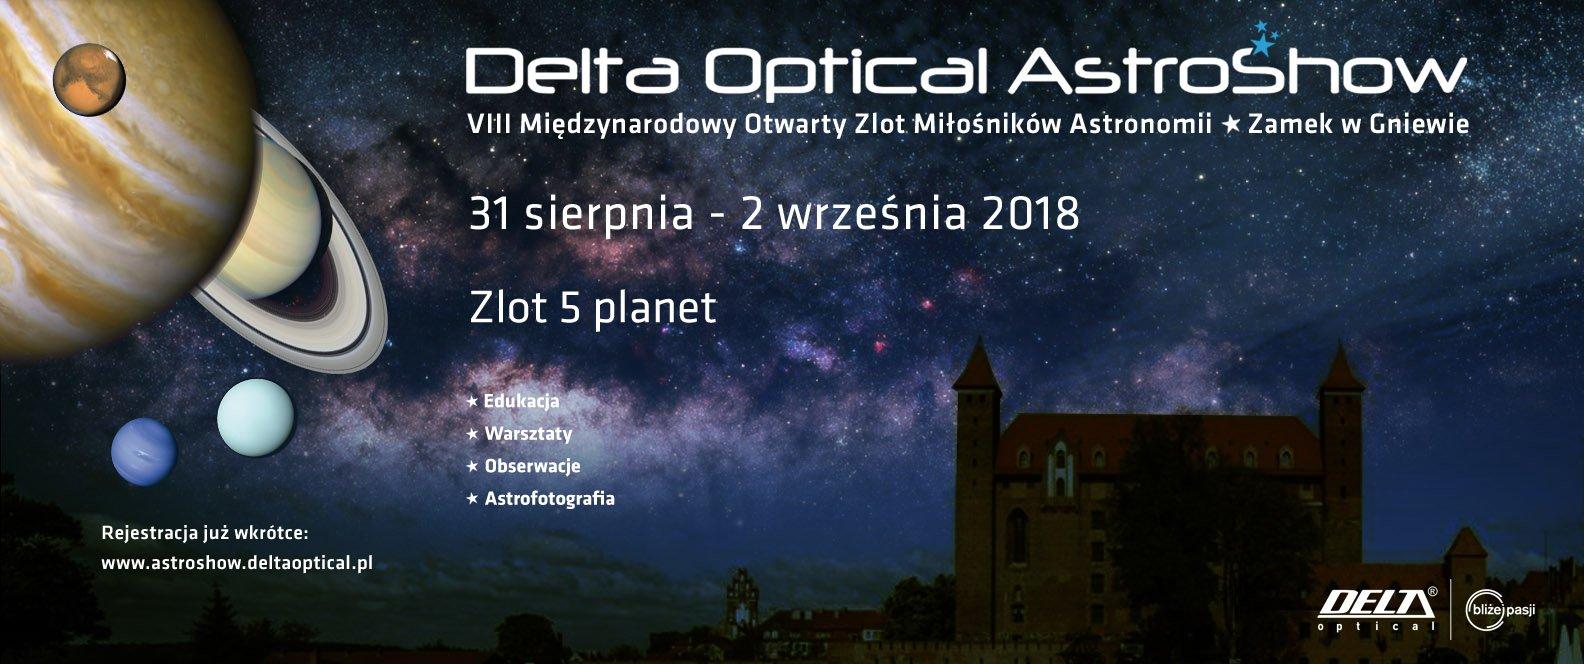 Delta Optical AstroShow @ Gniew   pomorskie   Polska